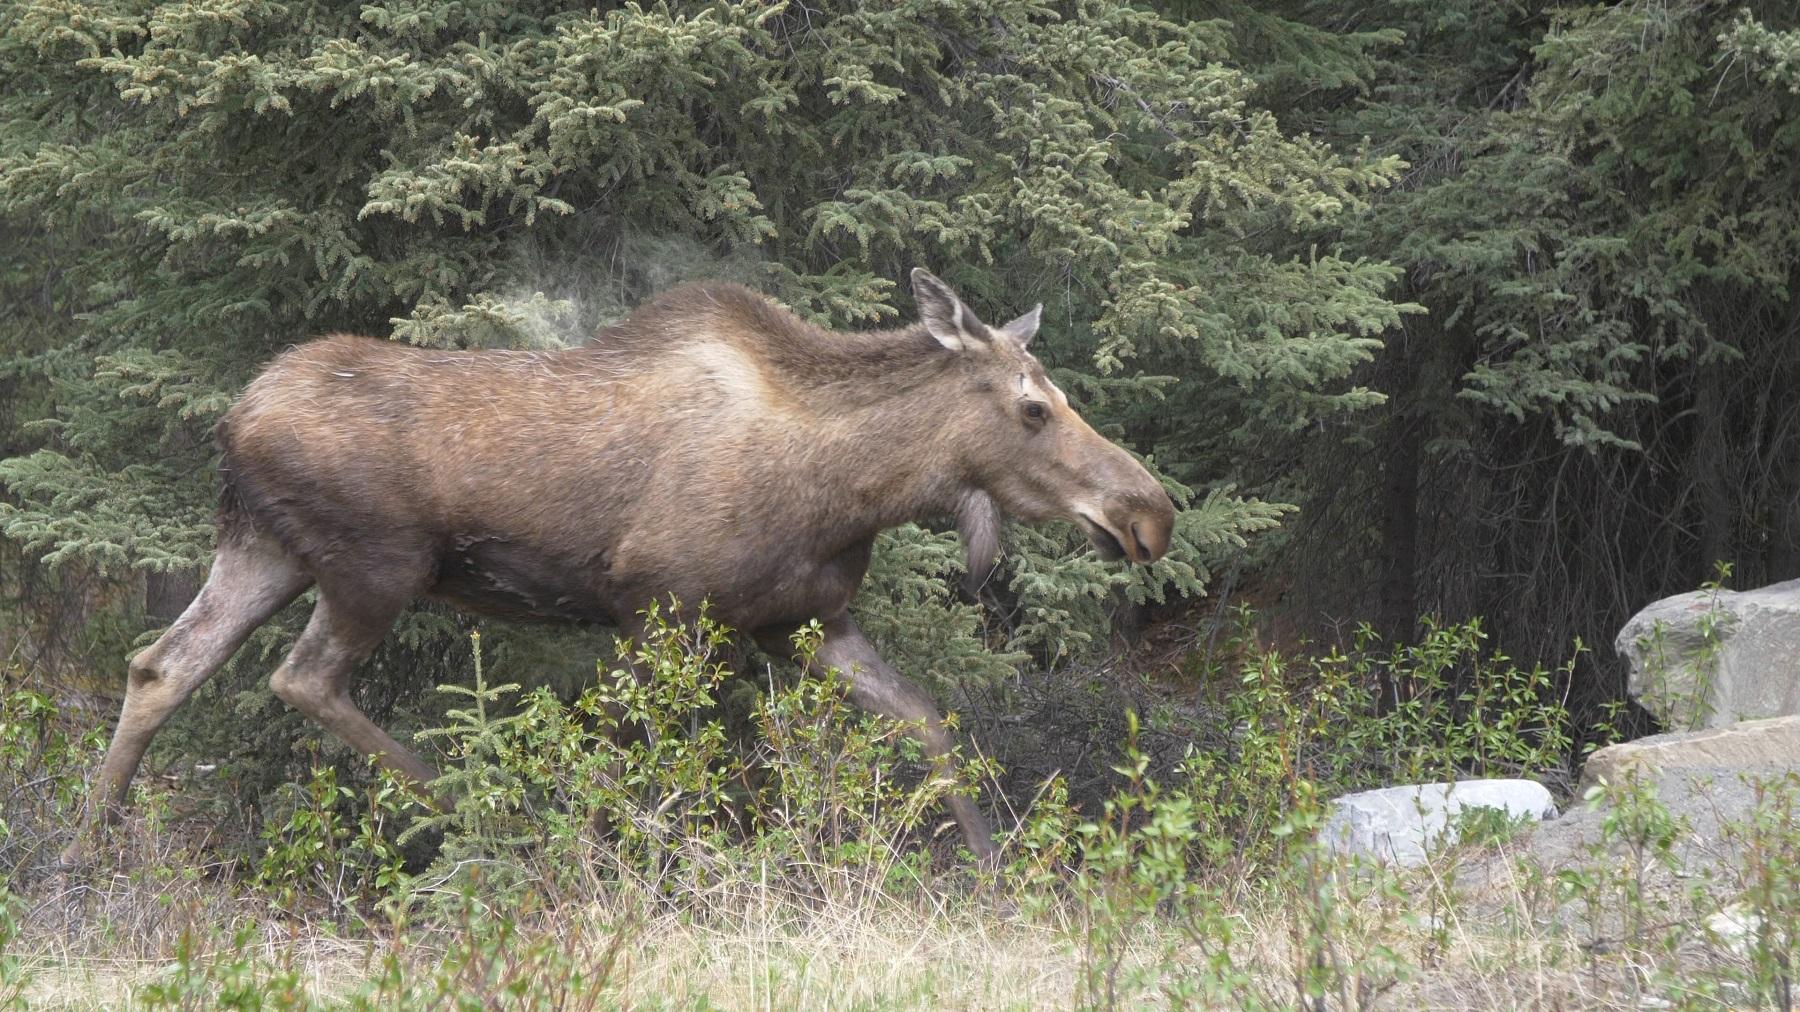 moose walking through trees and grass